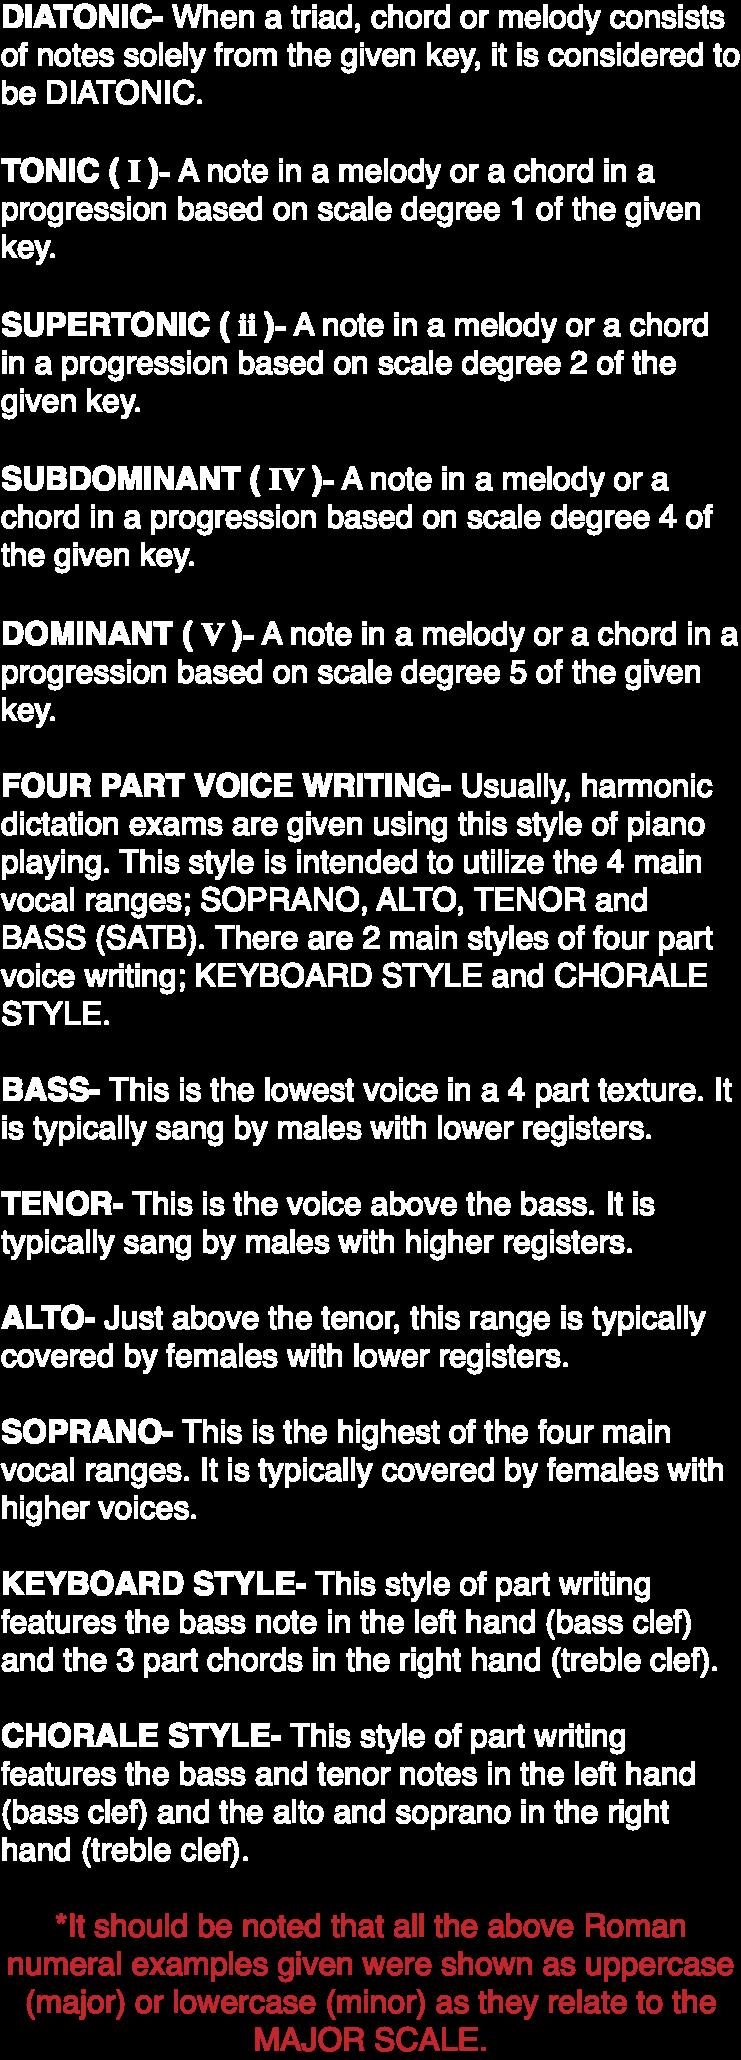 20 Harmonic Progression Pt.20 I, IV, V   Music Student 20020